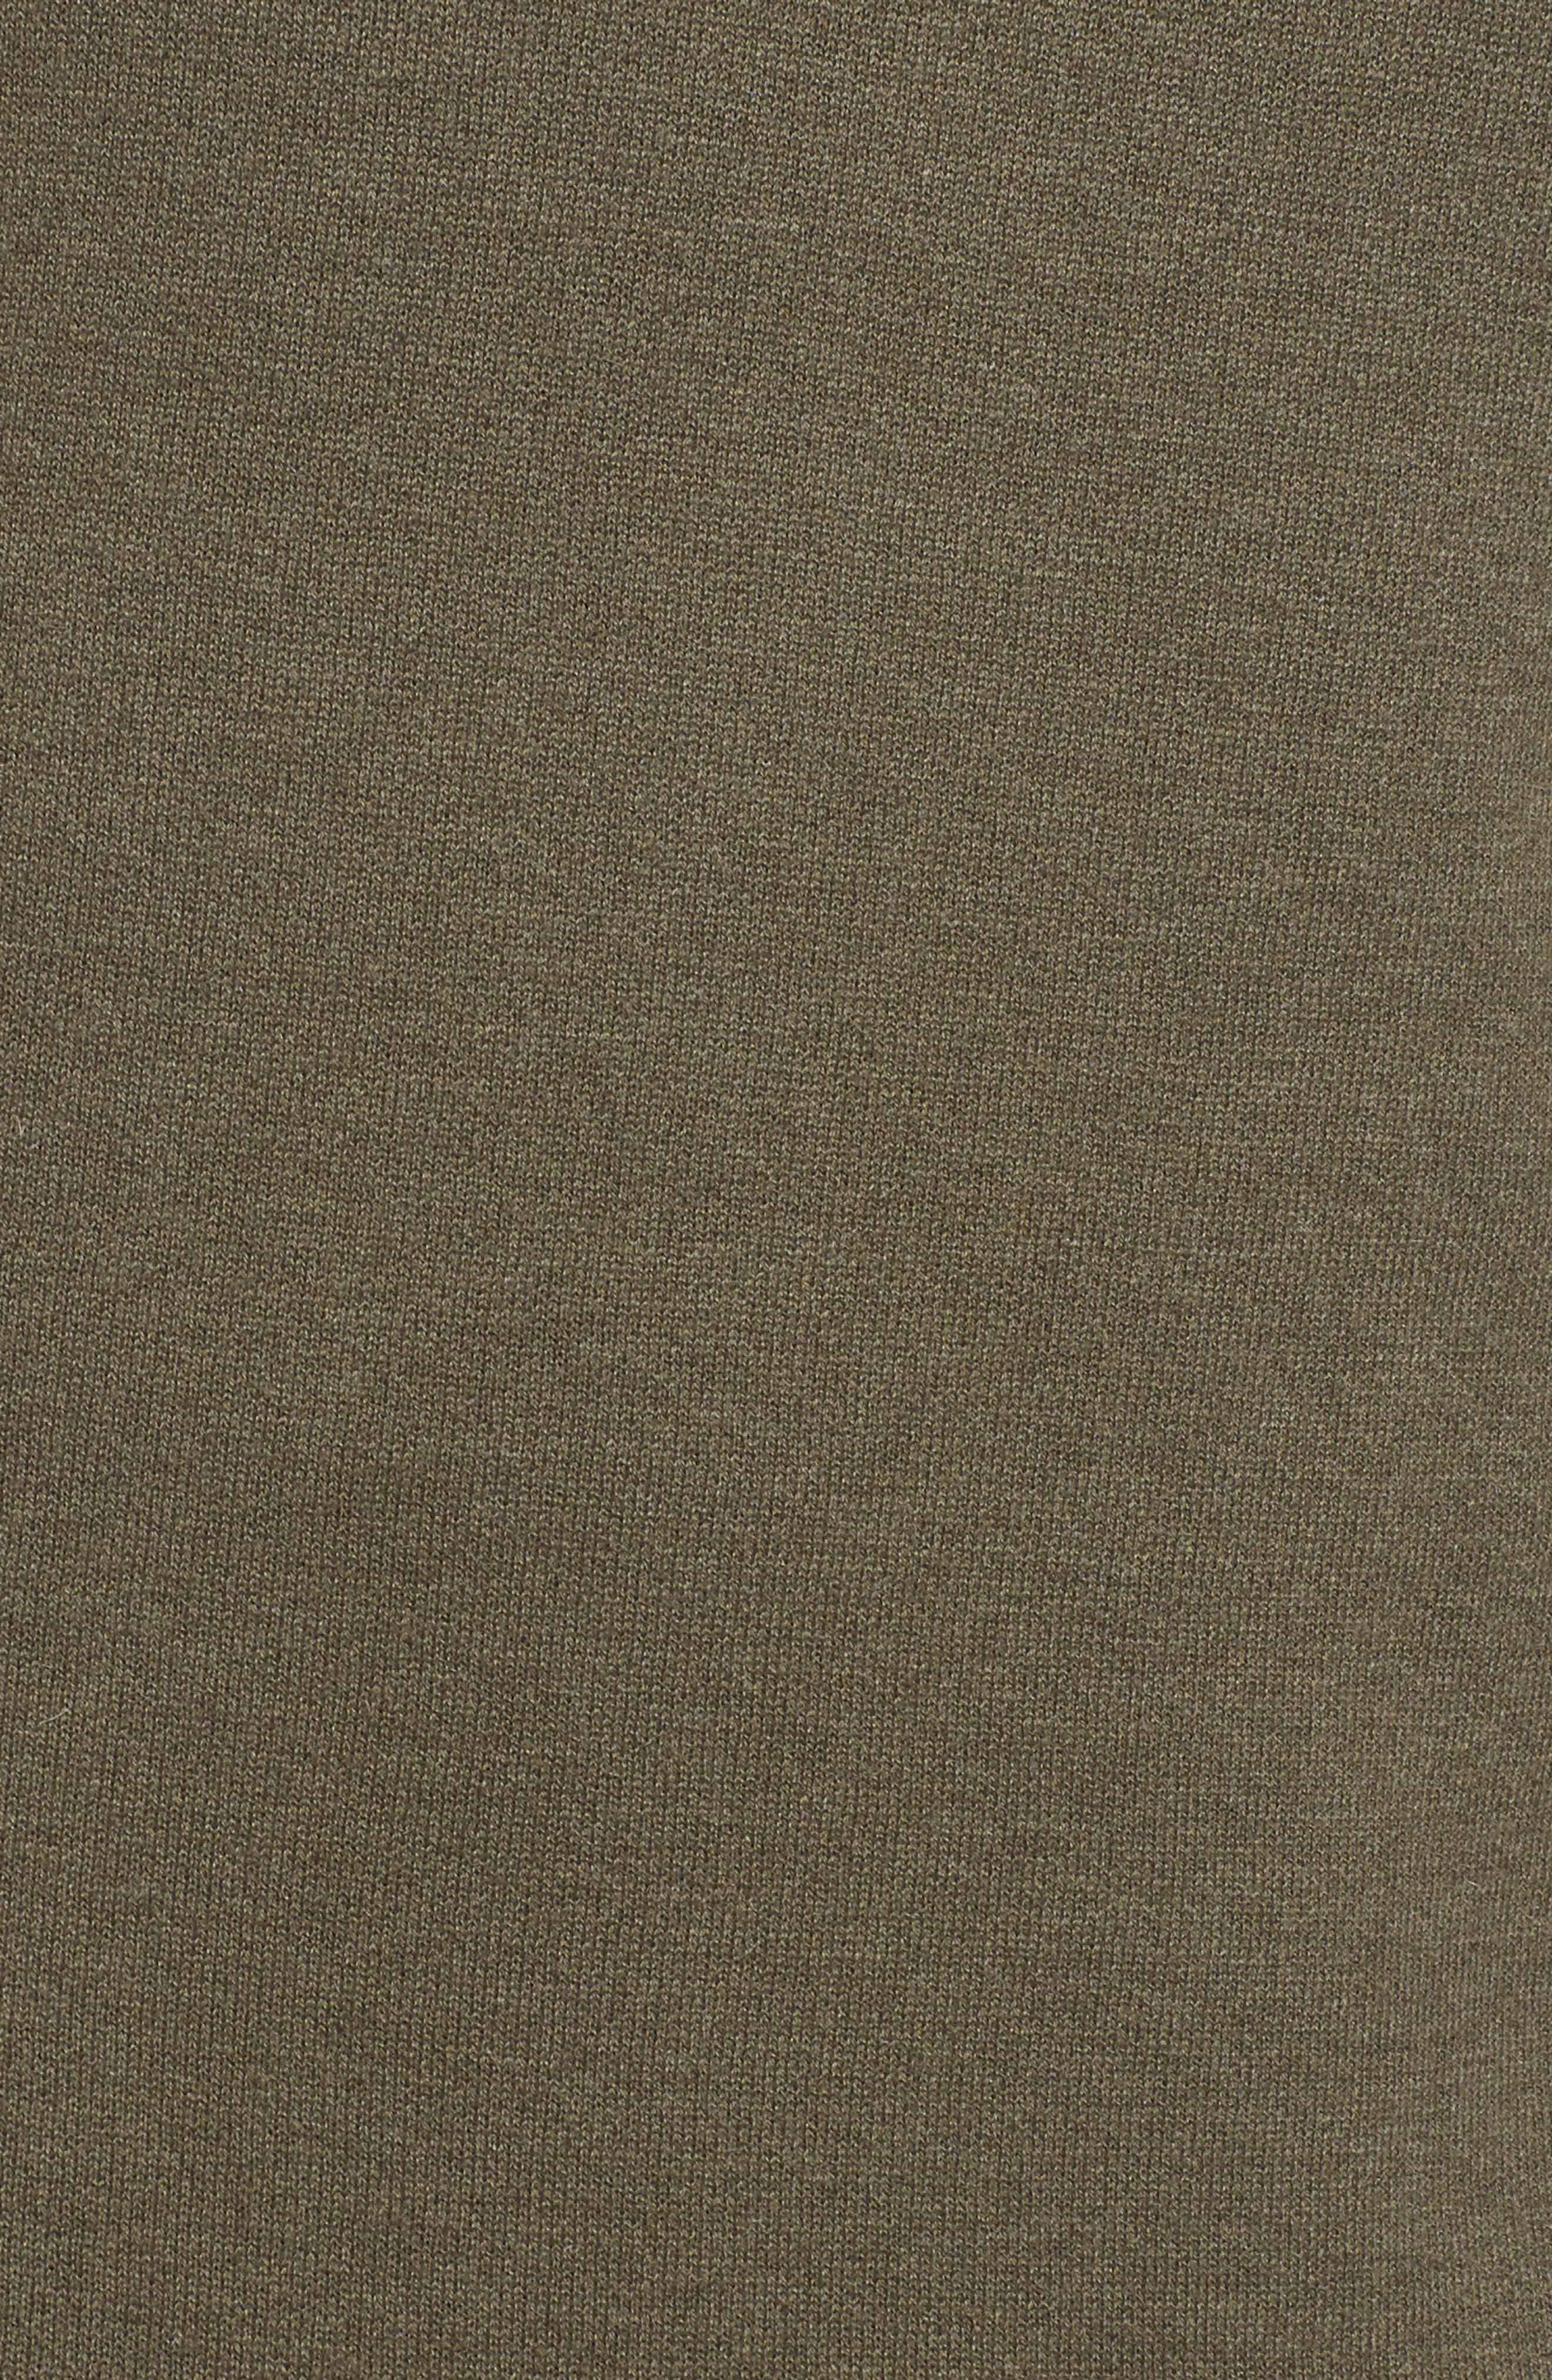 Alternate Image 5  - Nordstrom Signature Ruffle Hem Cashmere Blend Tunic